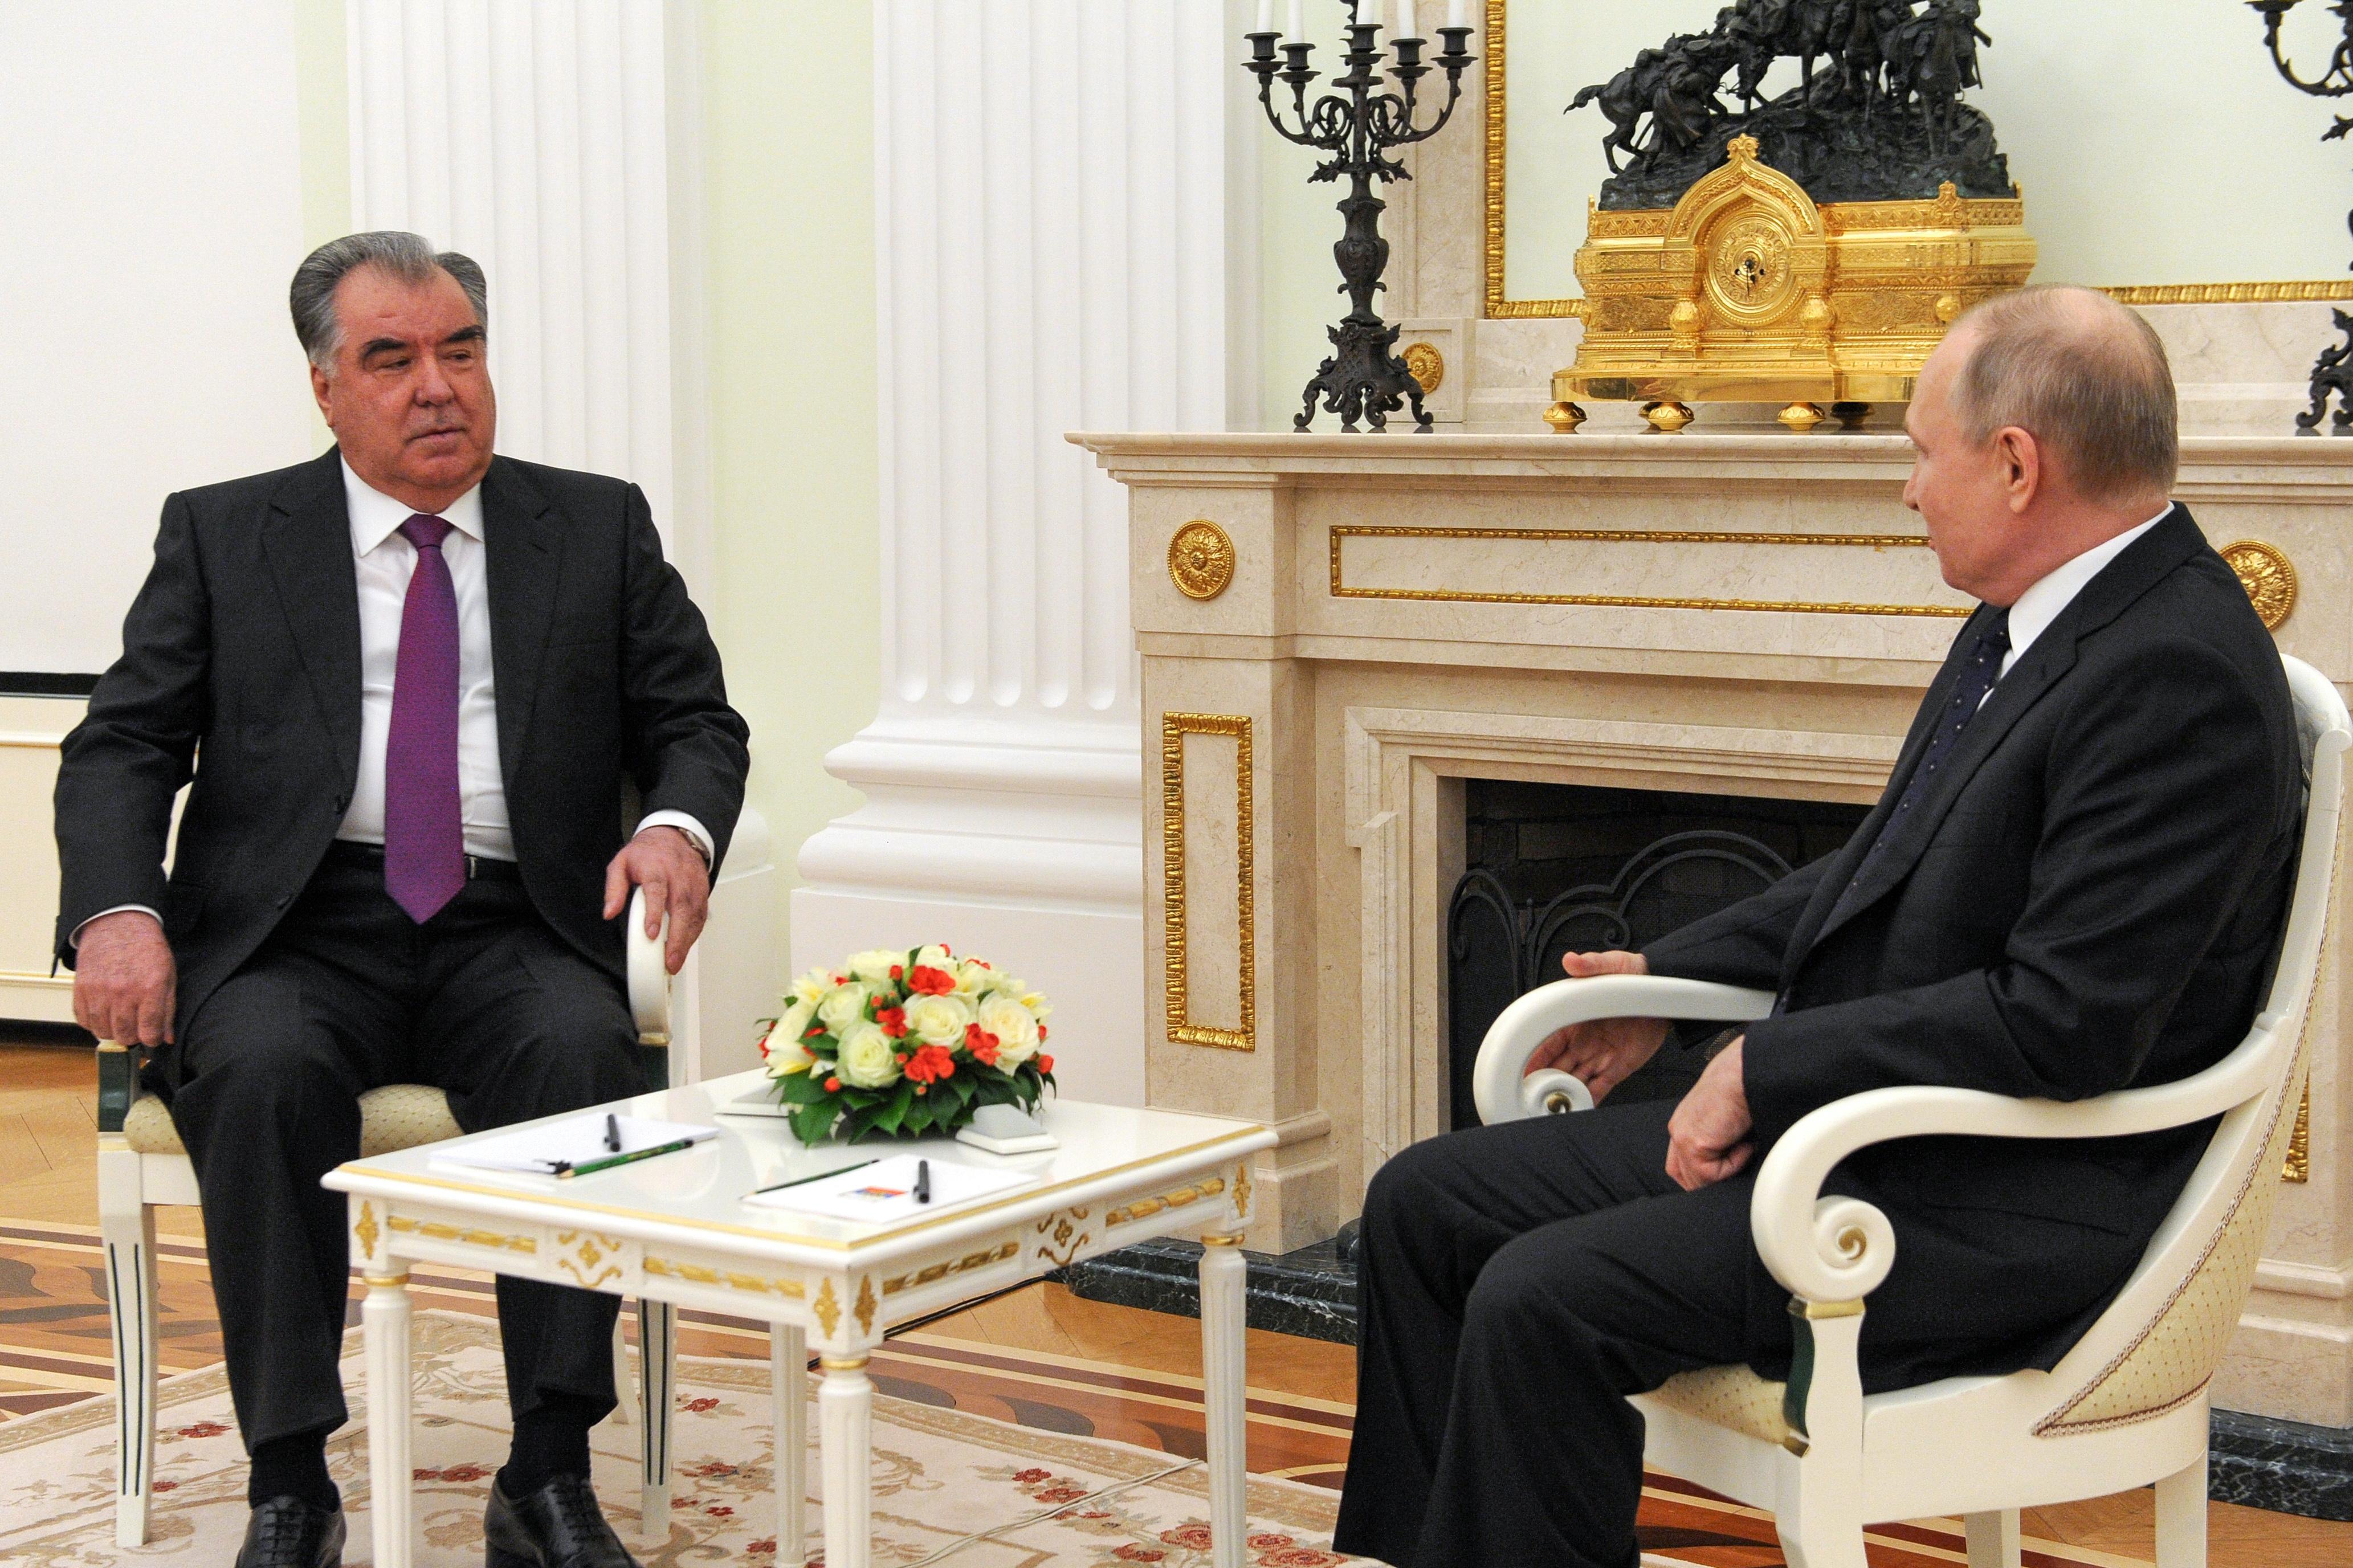 Russian President Vladimir Putin attends a meeting with his Tajik counterpart Emomali Rakhmon in Moscow, Russia May 8, 2021. Sputnik/Mikhail Klimentyev/Kremlin via REUTERS